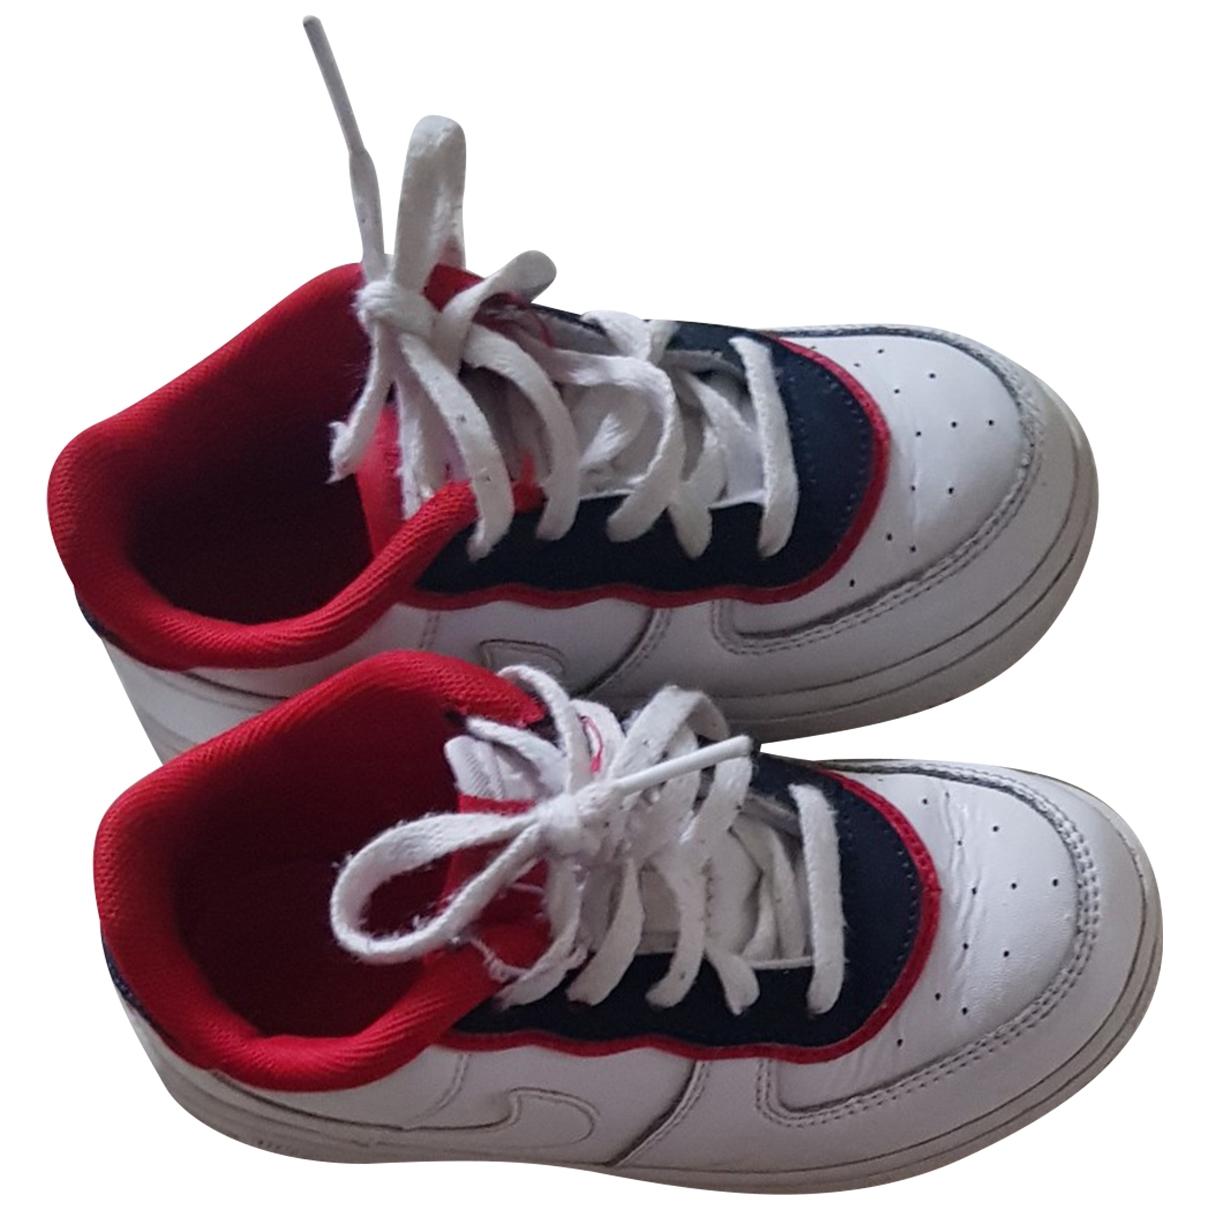 Nike Air Force 1 White Cloth Trainers for Kids 27 EU